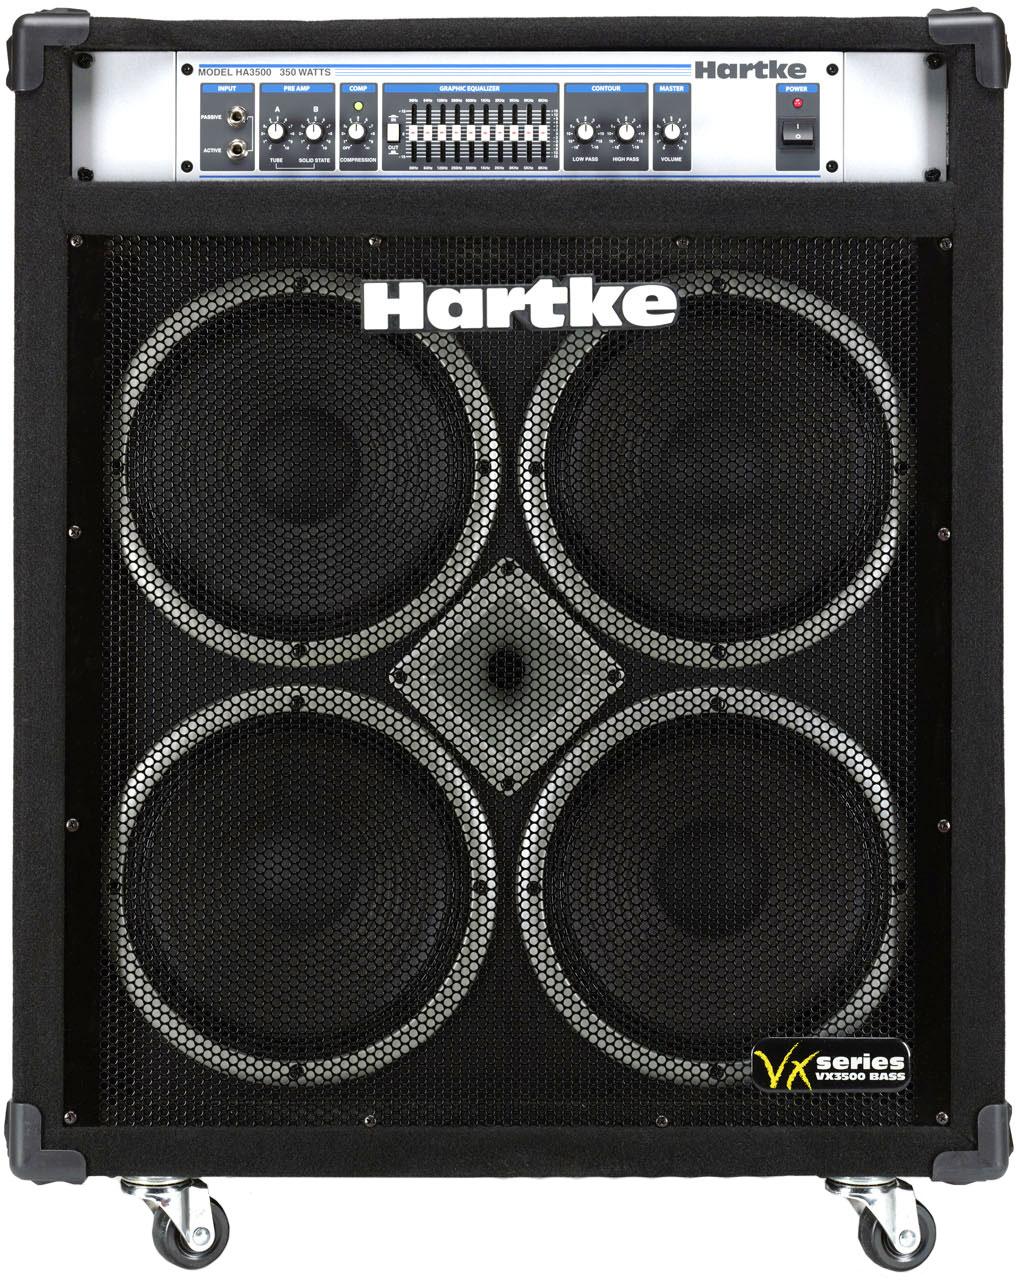 Hartke VX3500 basversterker